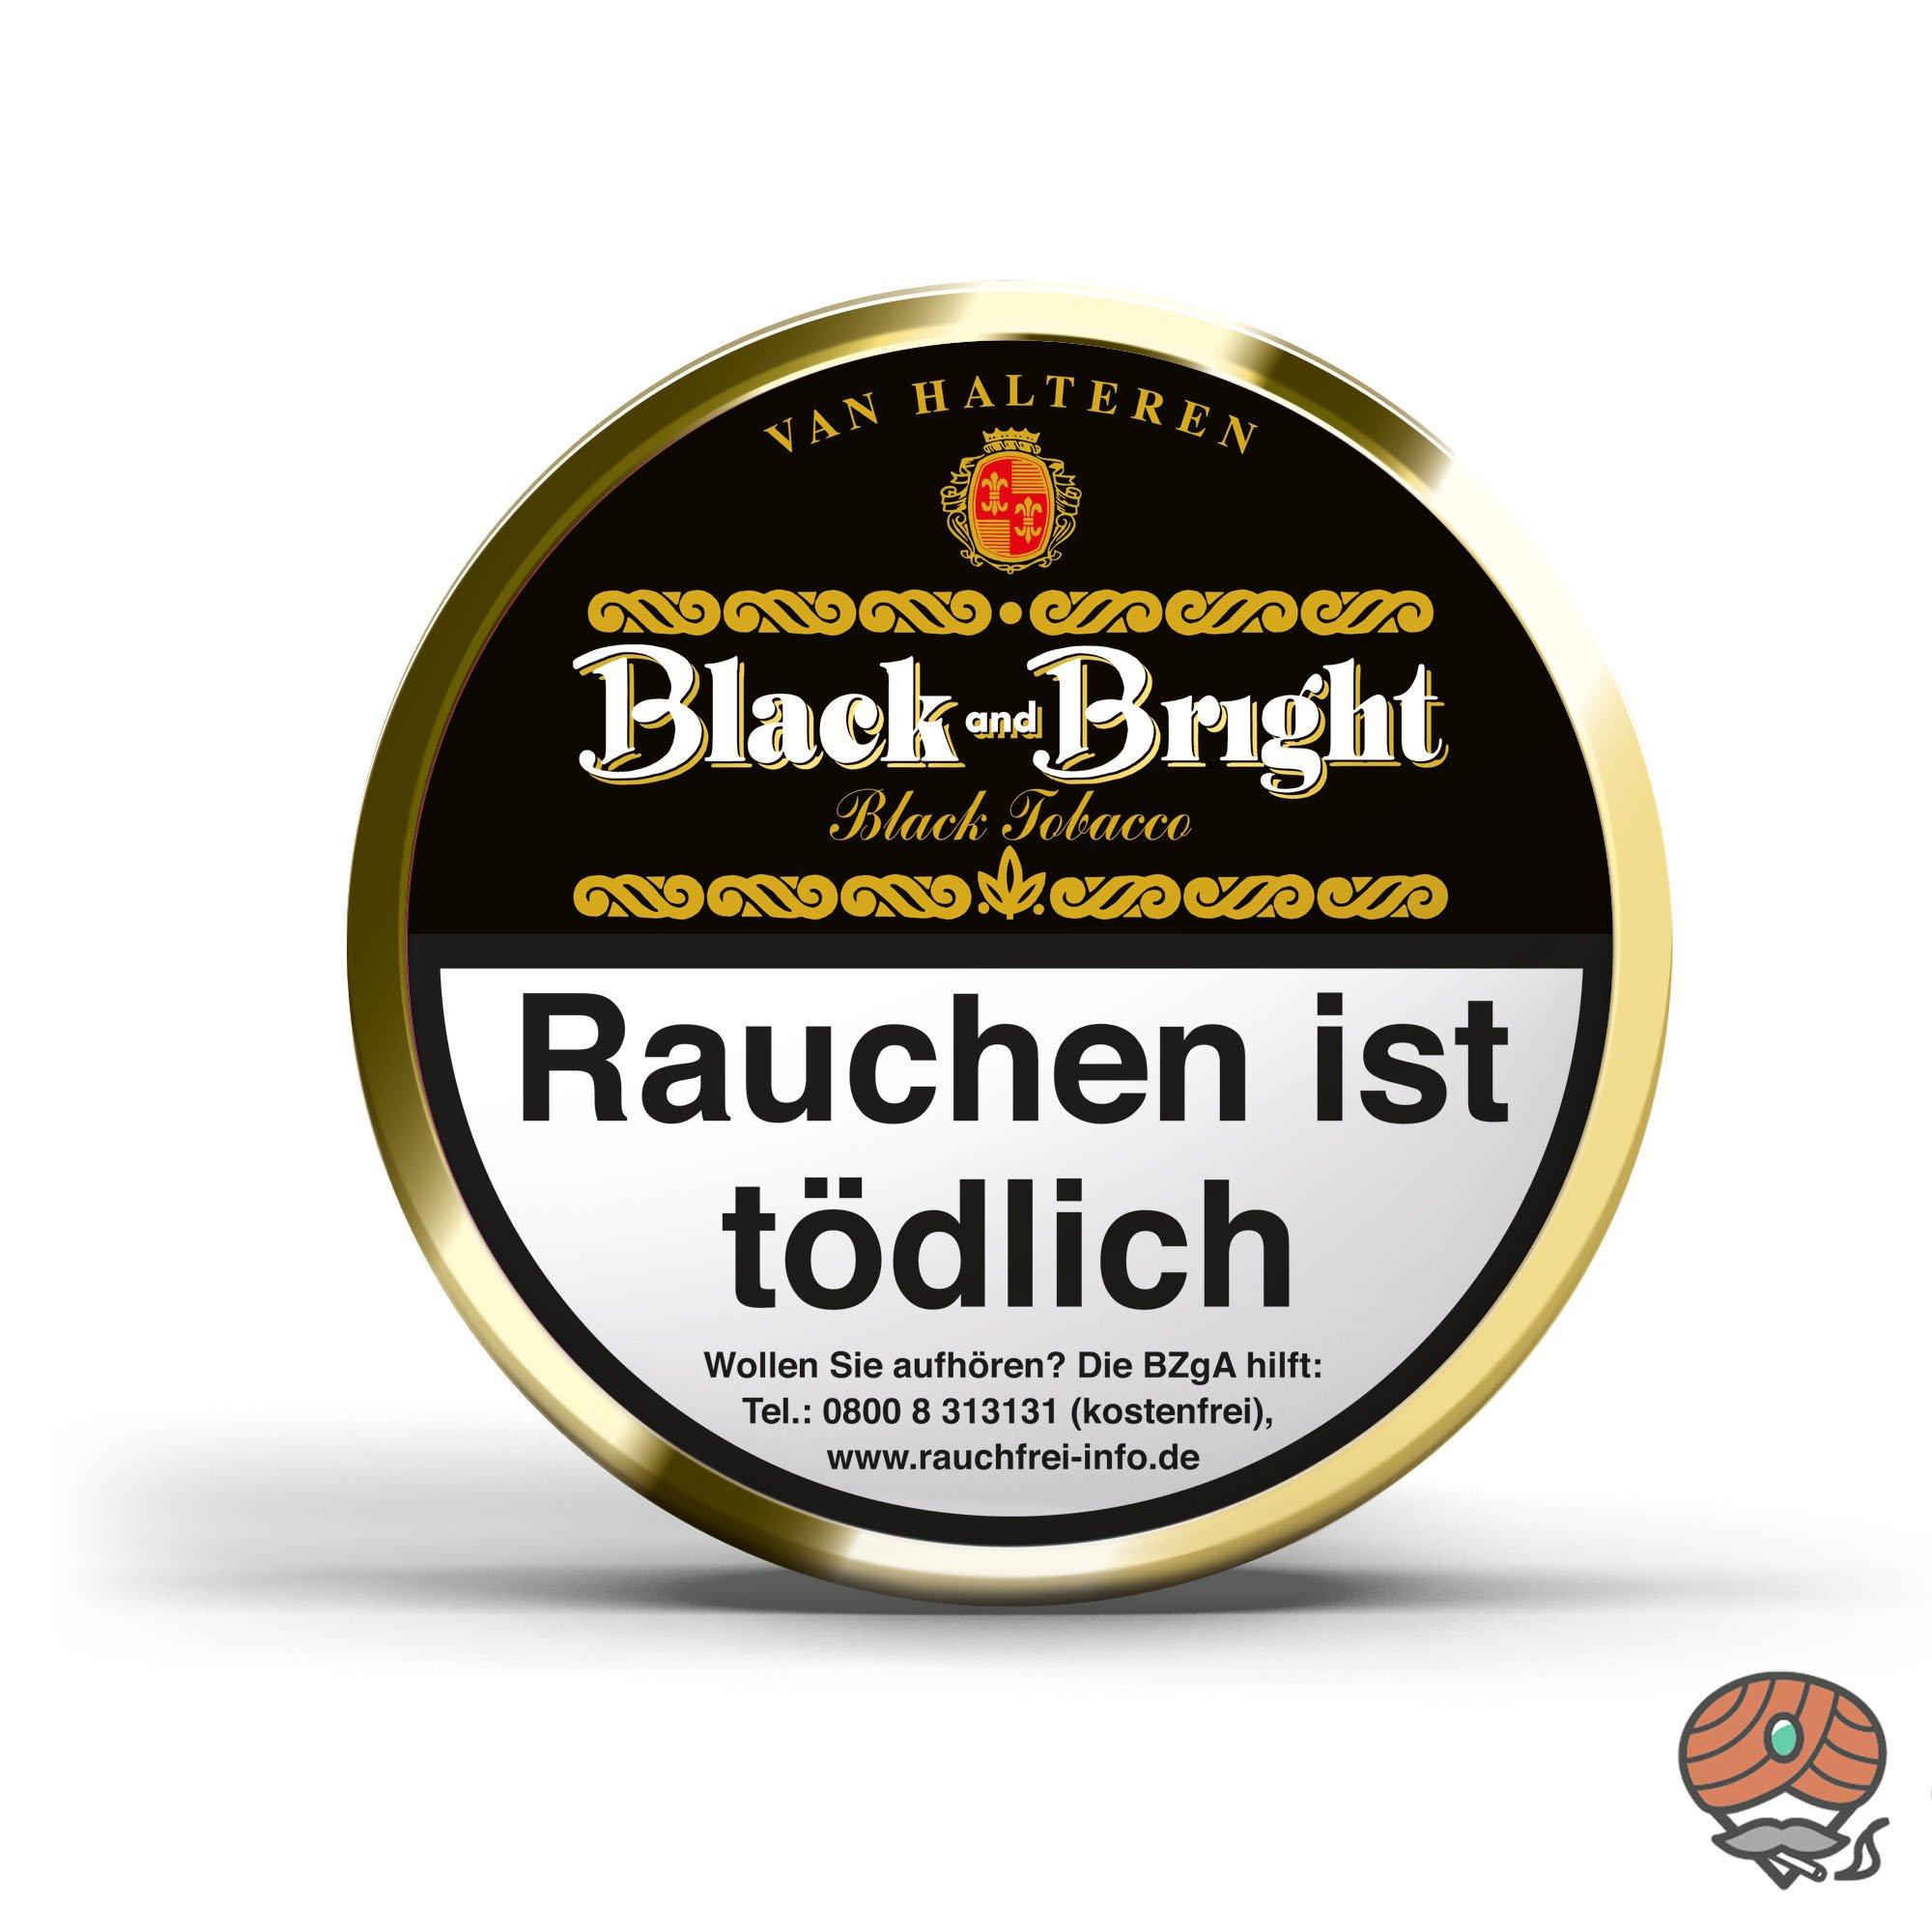 Van Halteren Black and Bright Pfeifentabak 100g Dose